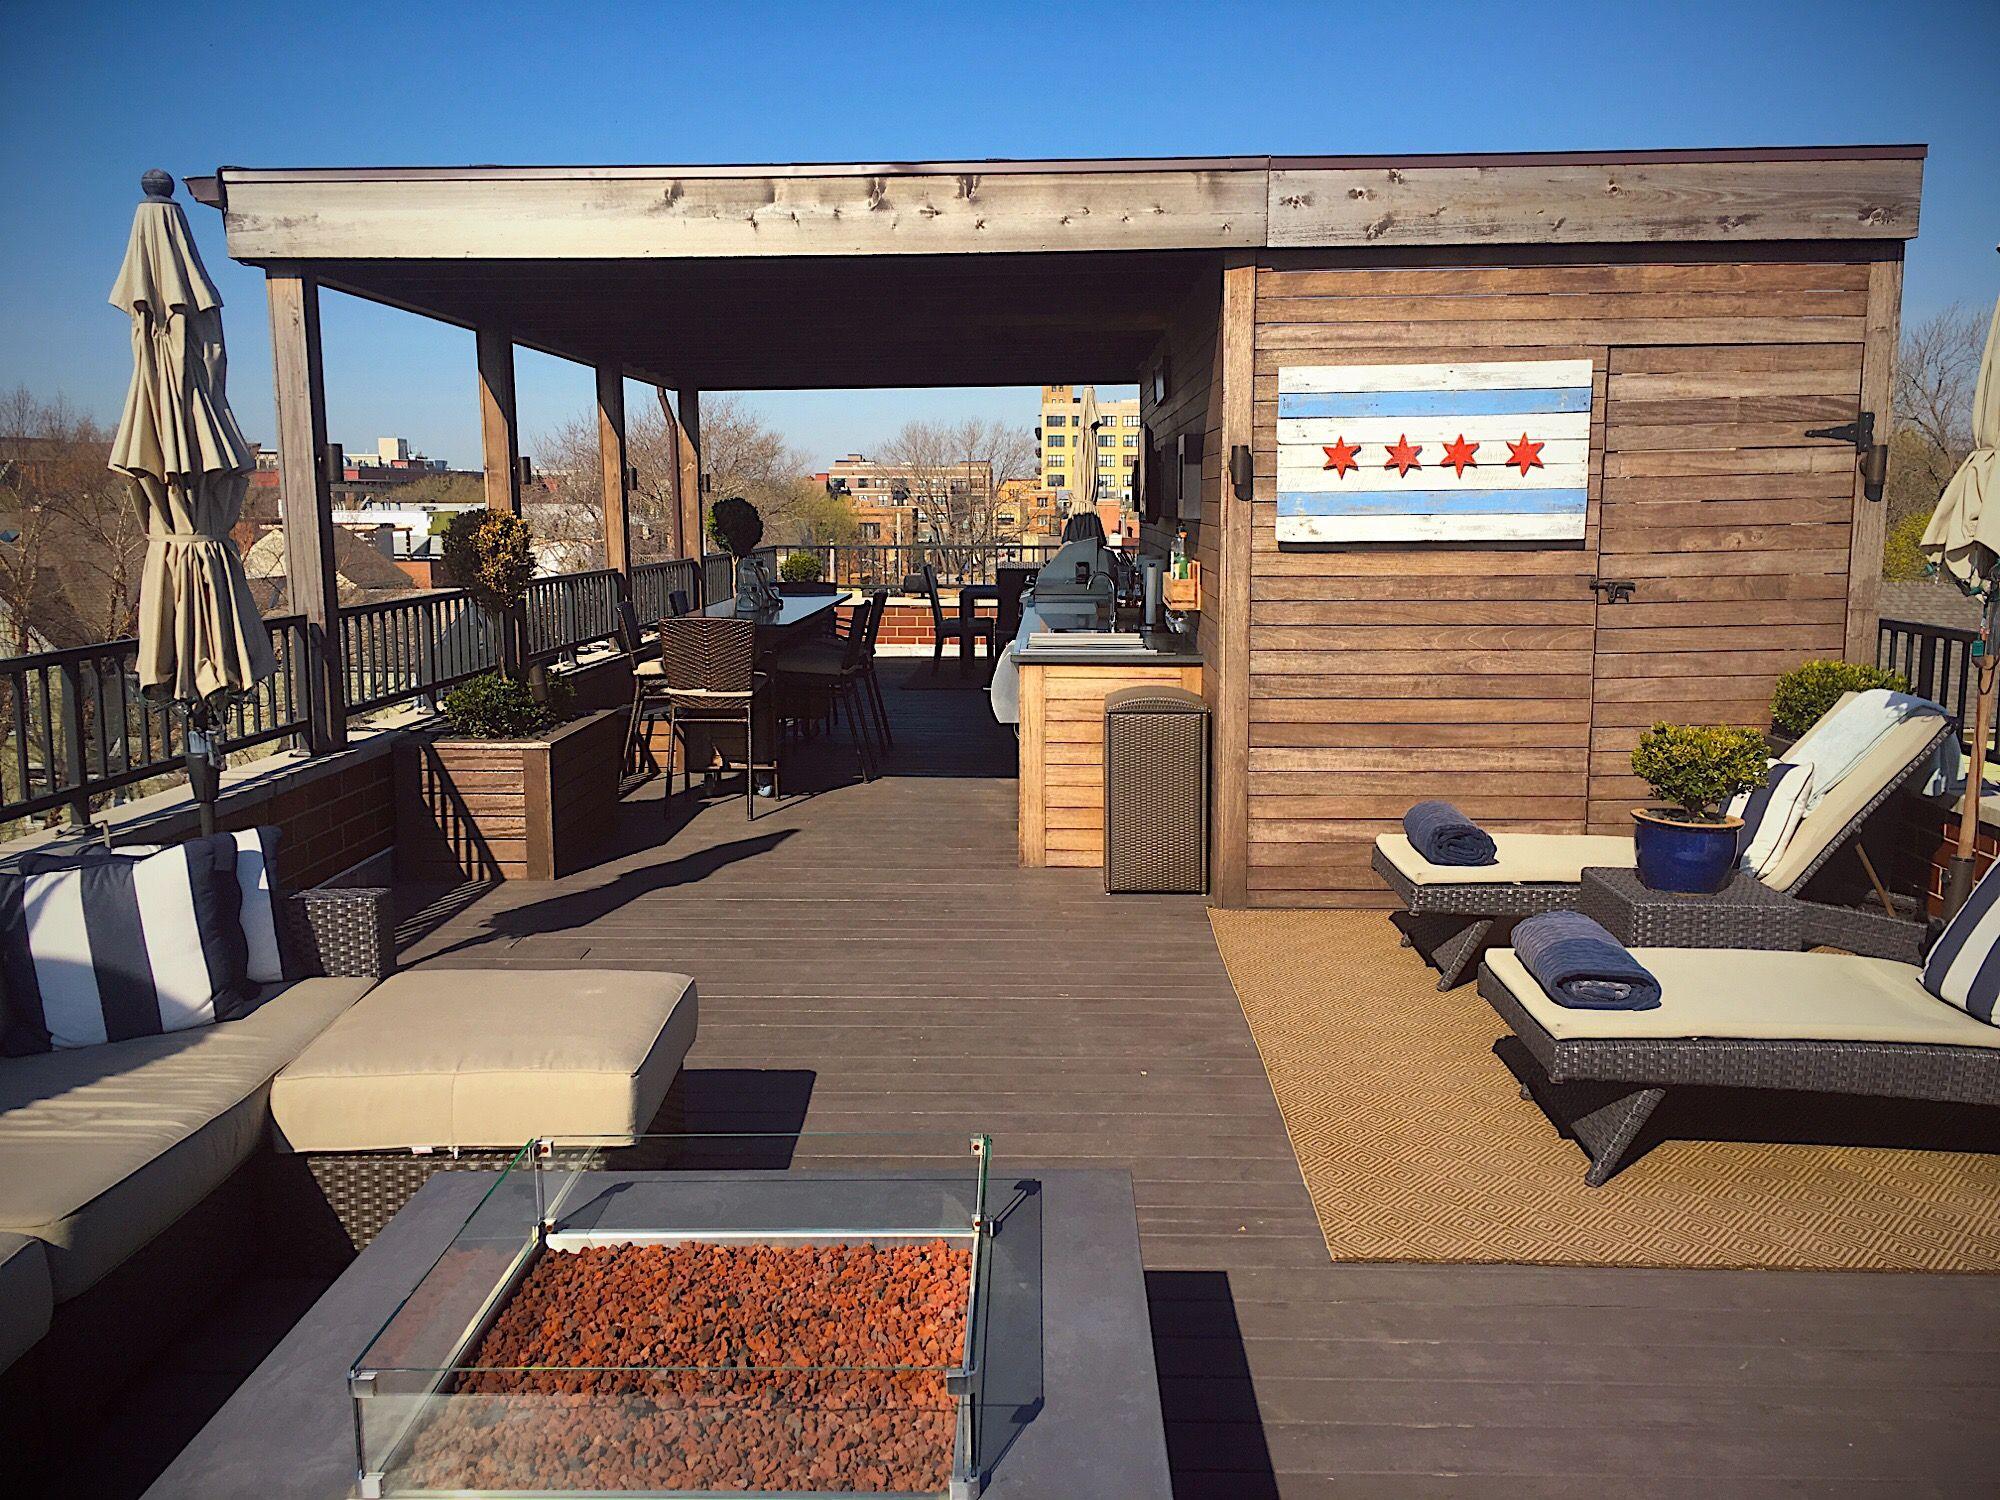 Rooftop Deck Roof RooftopDeck BBQ OutdoorKitchen Kitchen